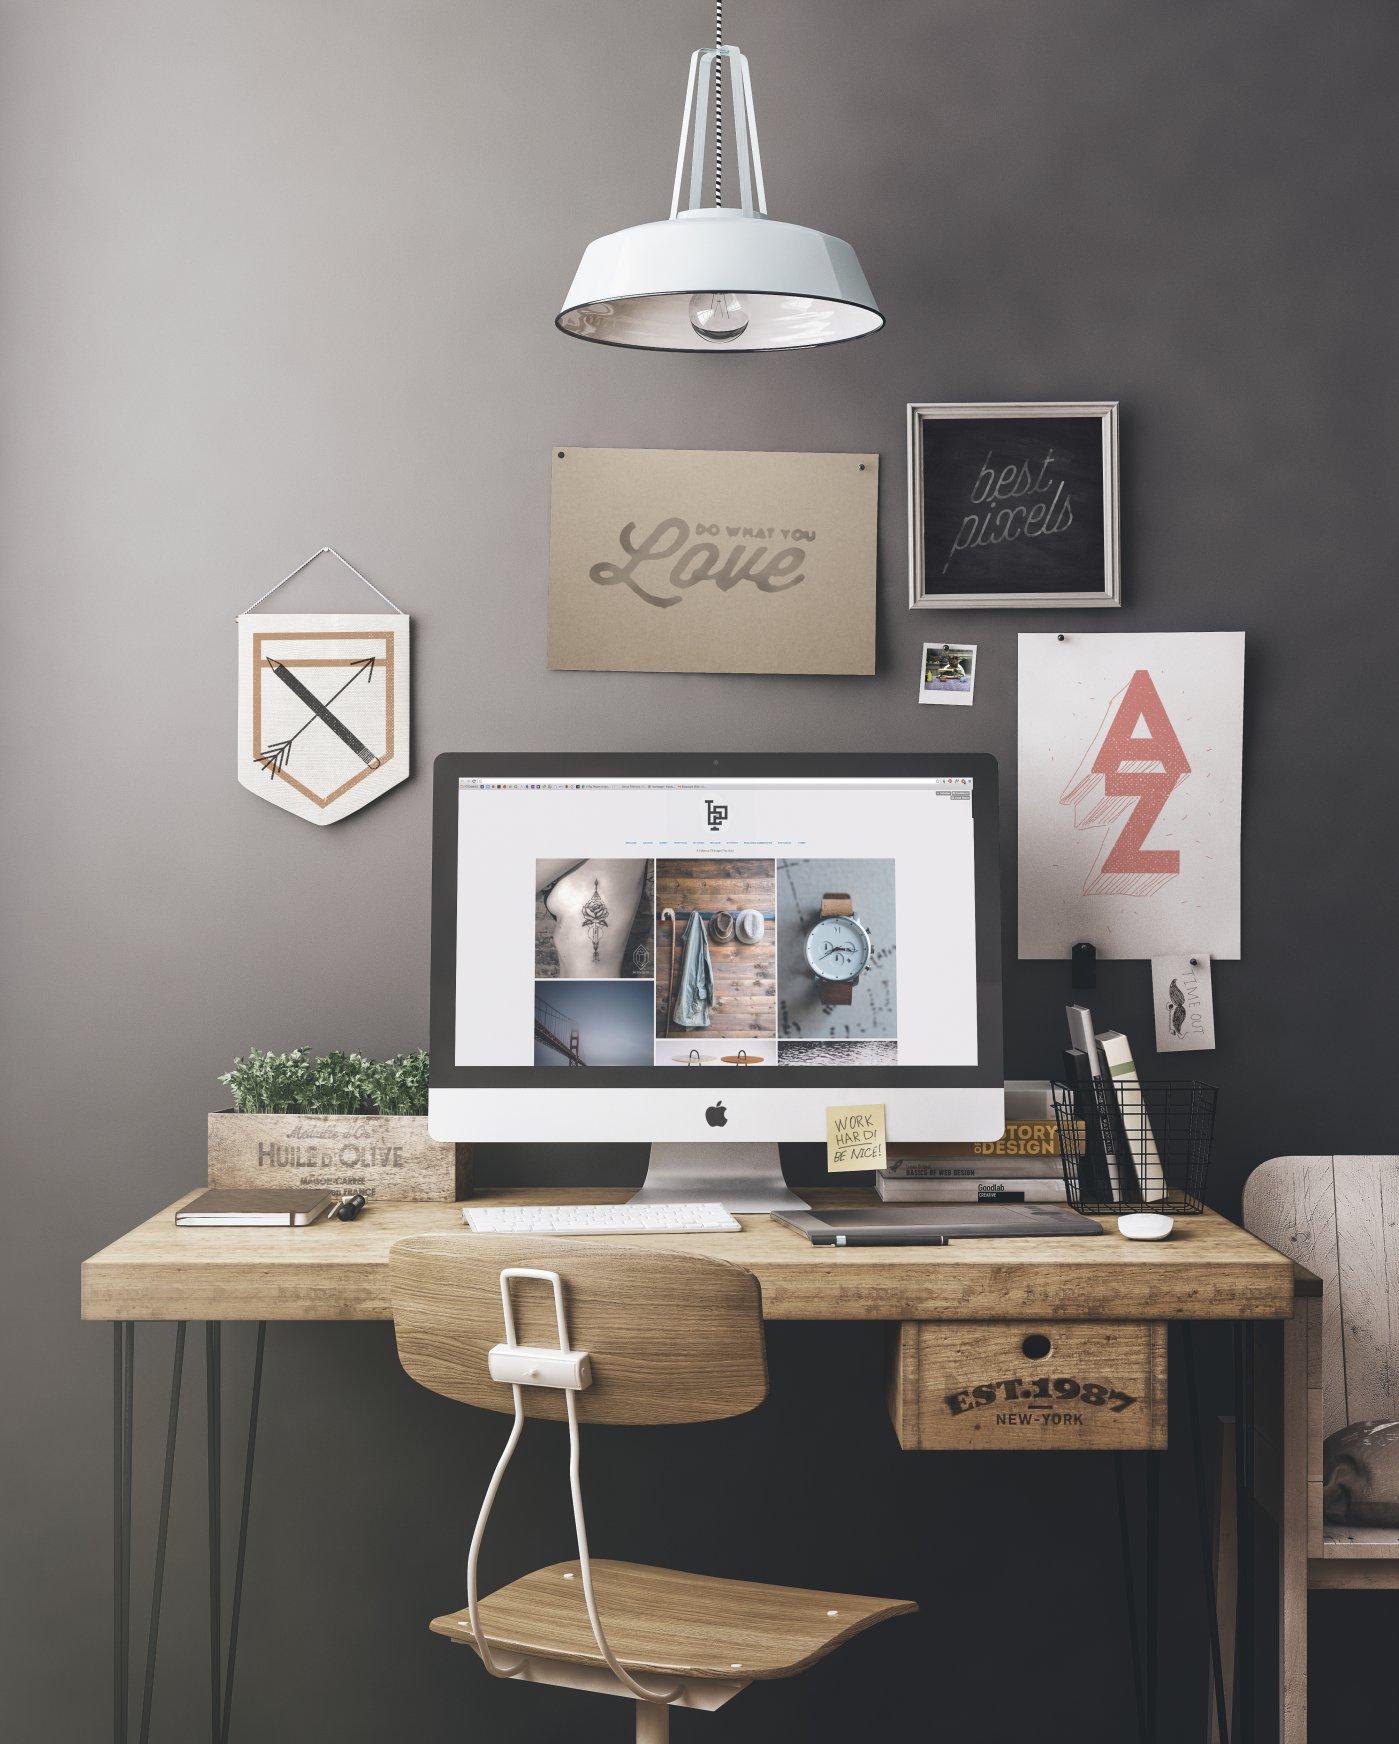 Free Workspace Mockup